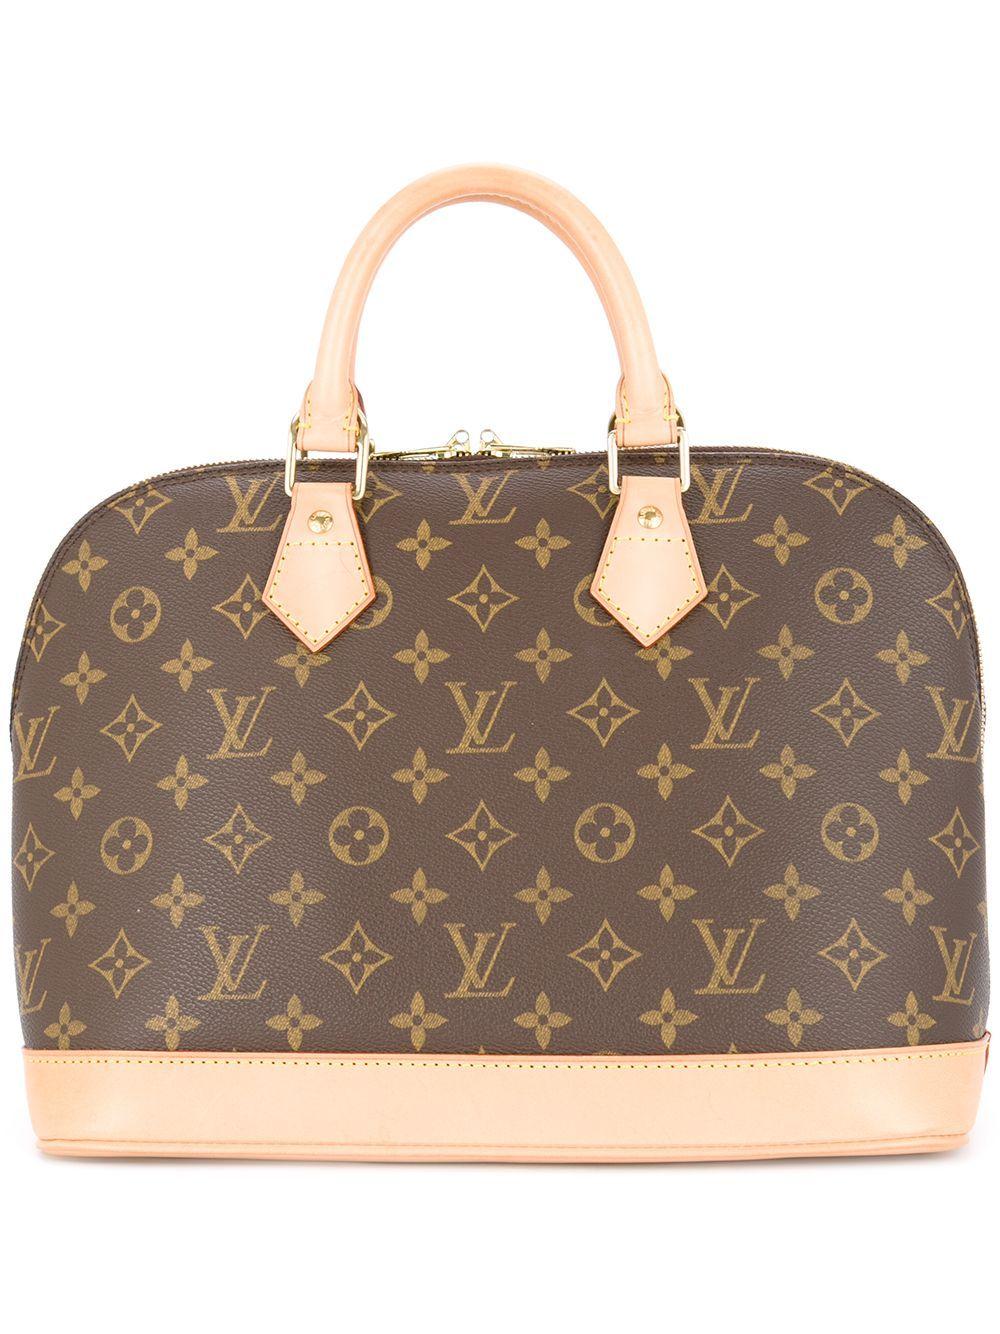 Pin By Zehan Siti On Louis Vuitton Malaysia In 2020 Vintage Louis Vuitton Bags Louis Vuitton